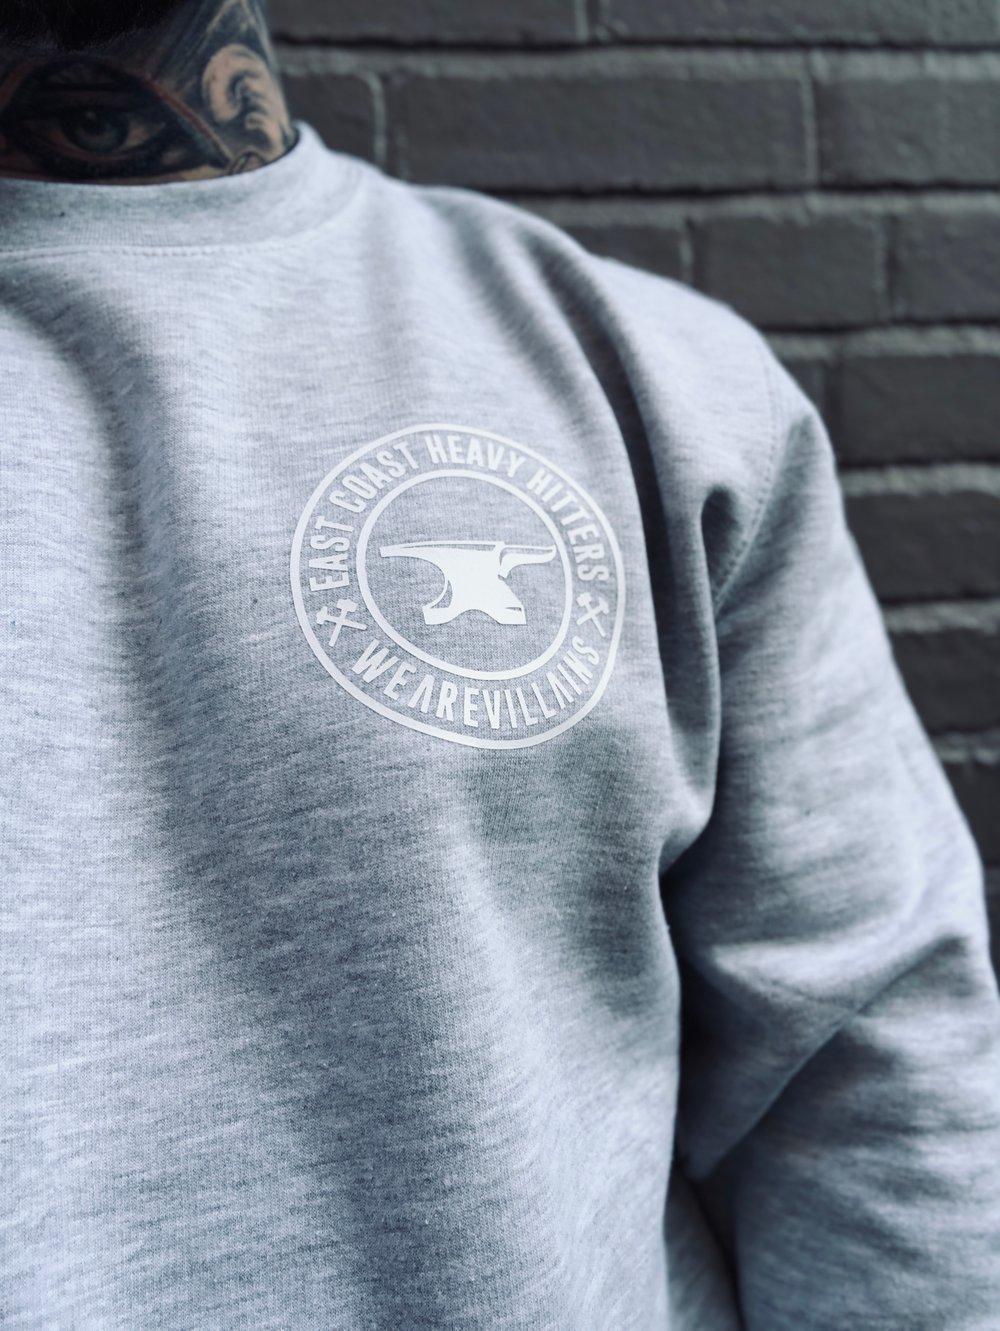 Image of East Coast Heavy Hitters Crewneck sweatshirt